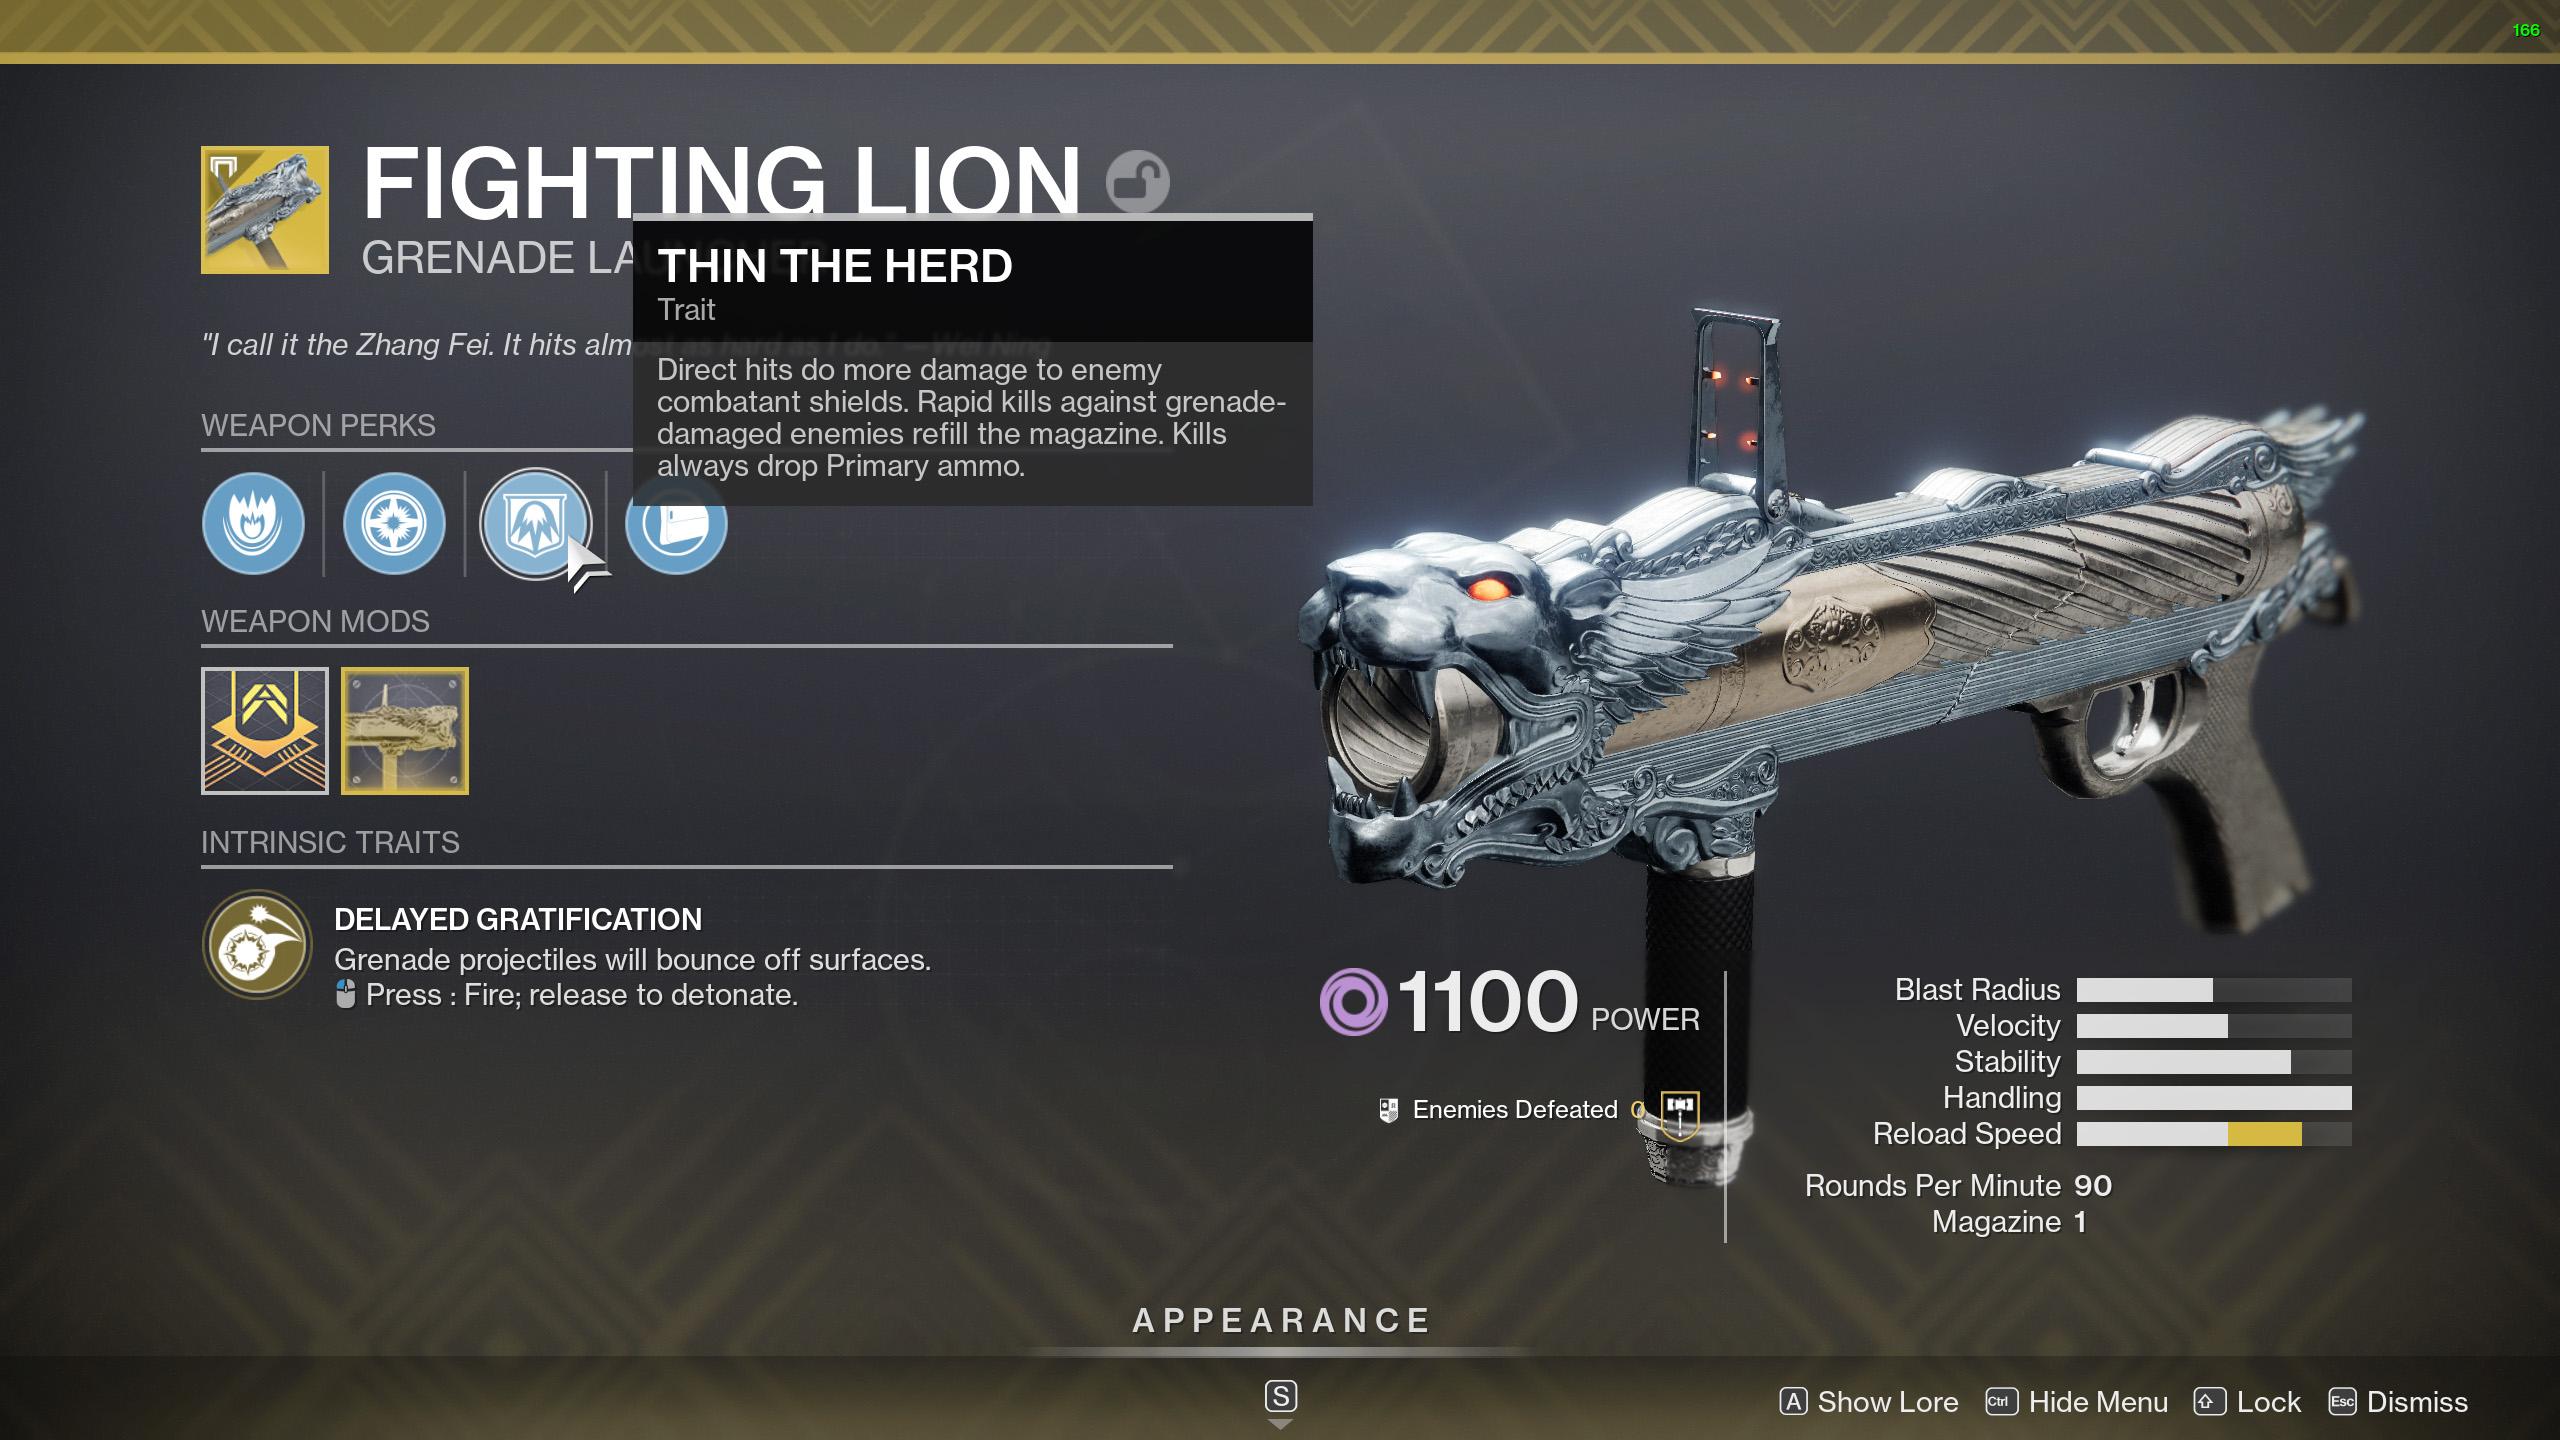 destiny 2 messy business fighting lion